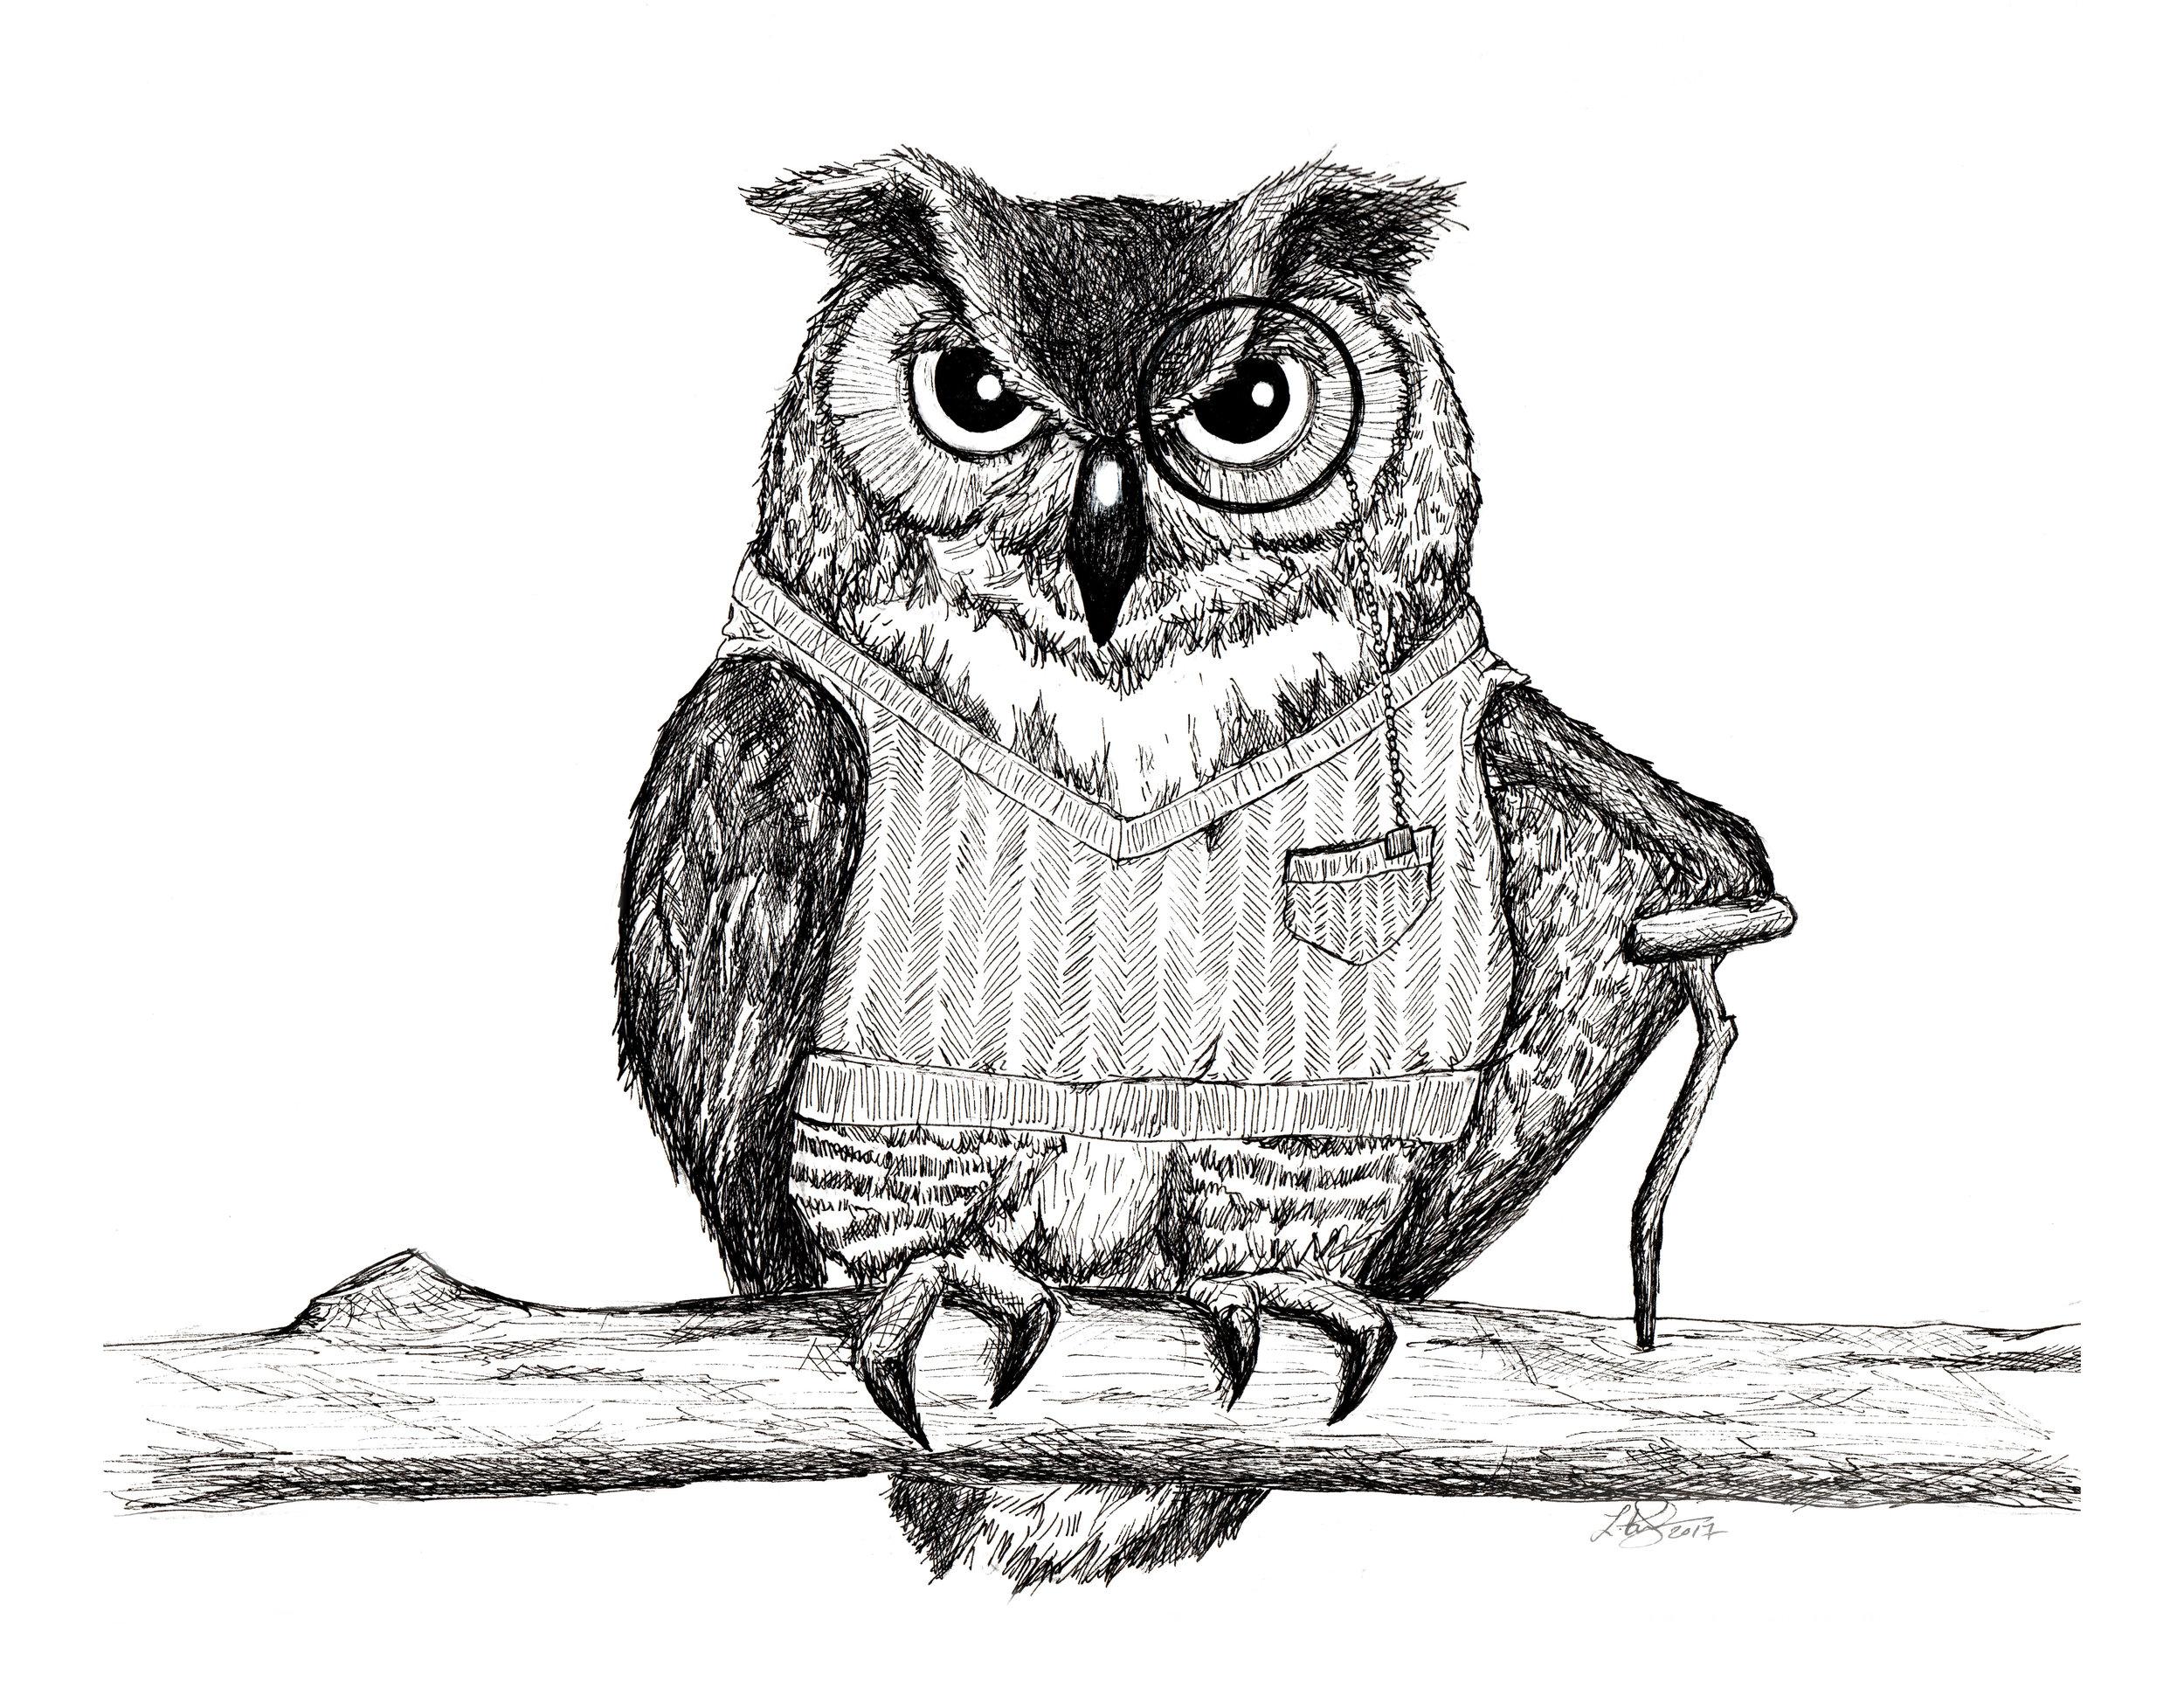 Grump Owl Print Etsy.jpg